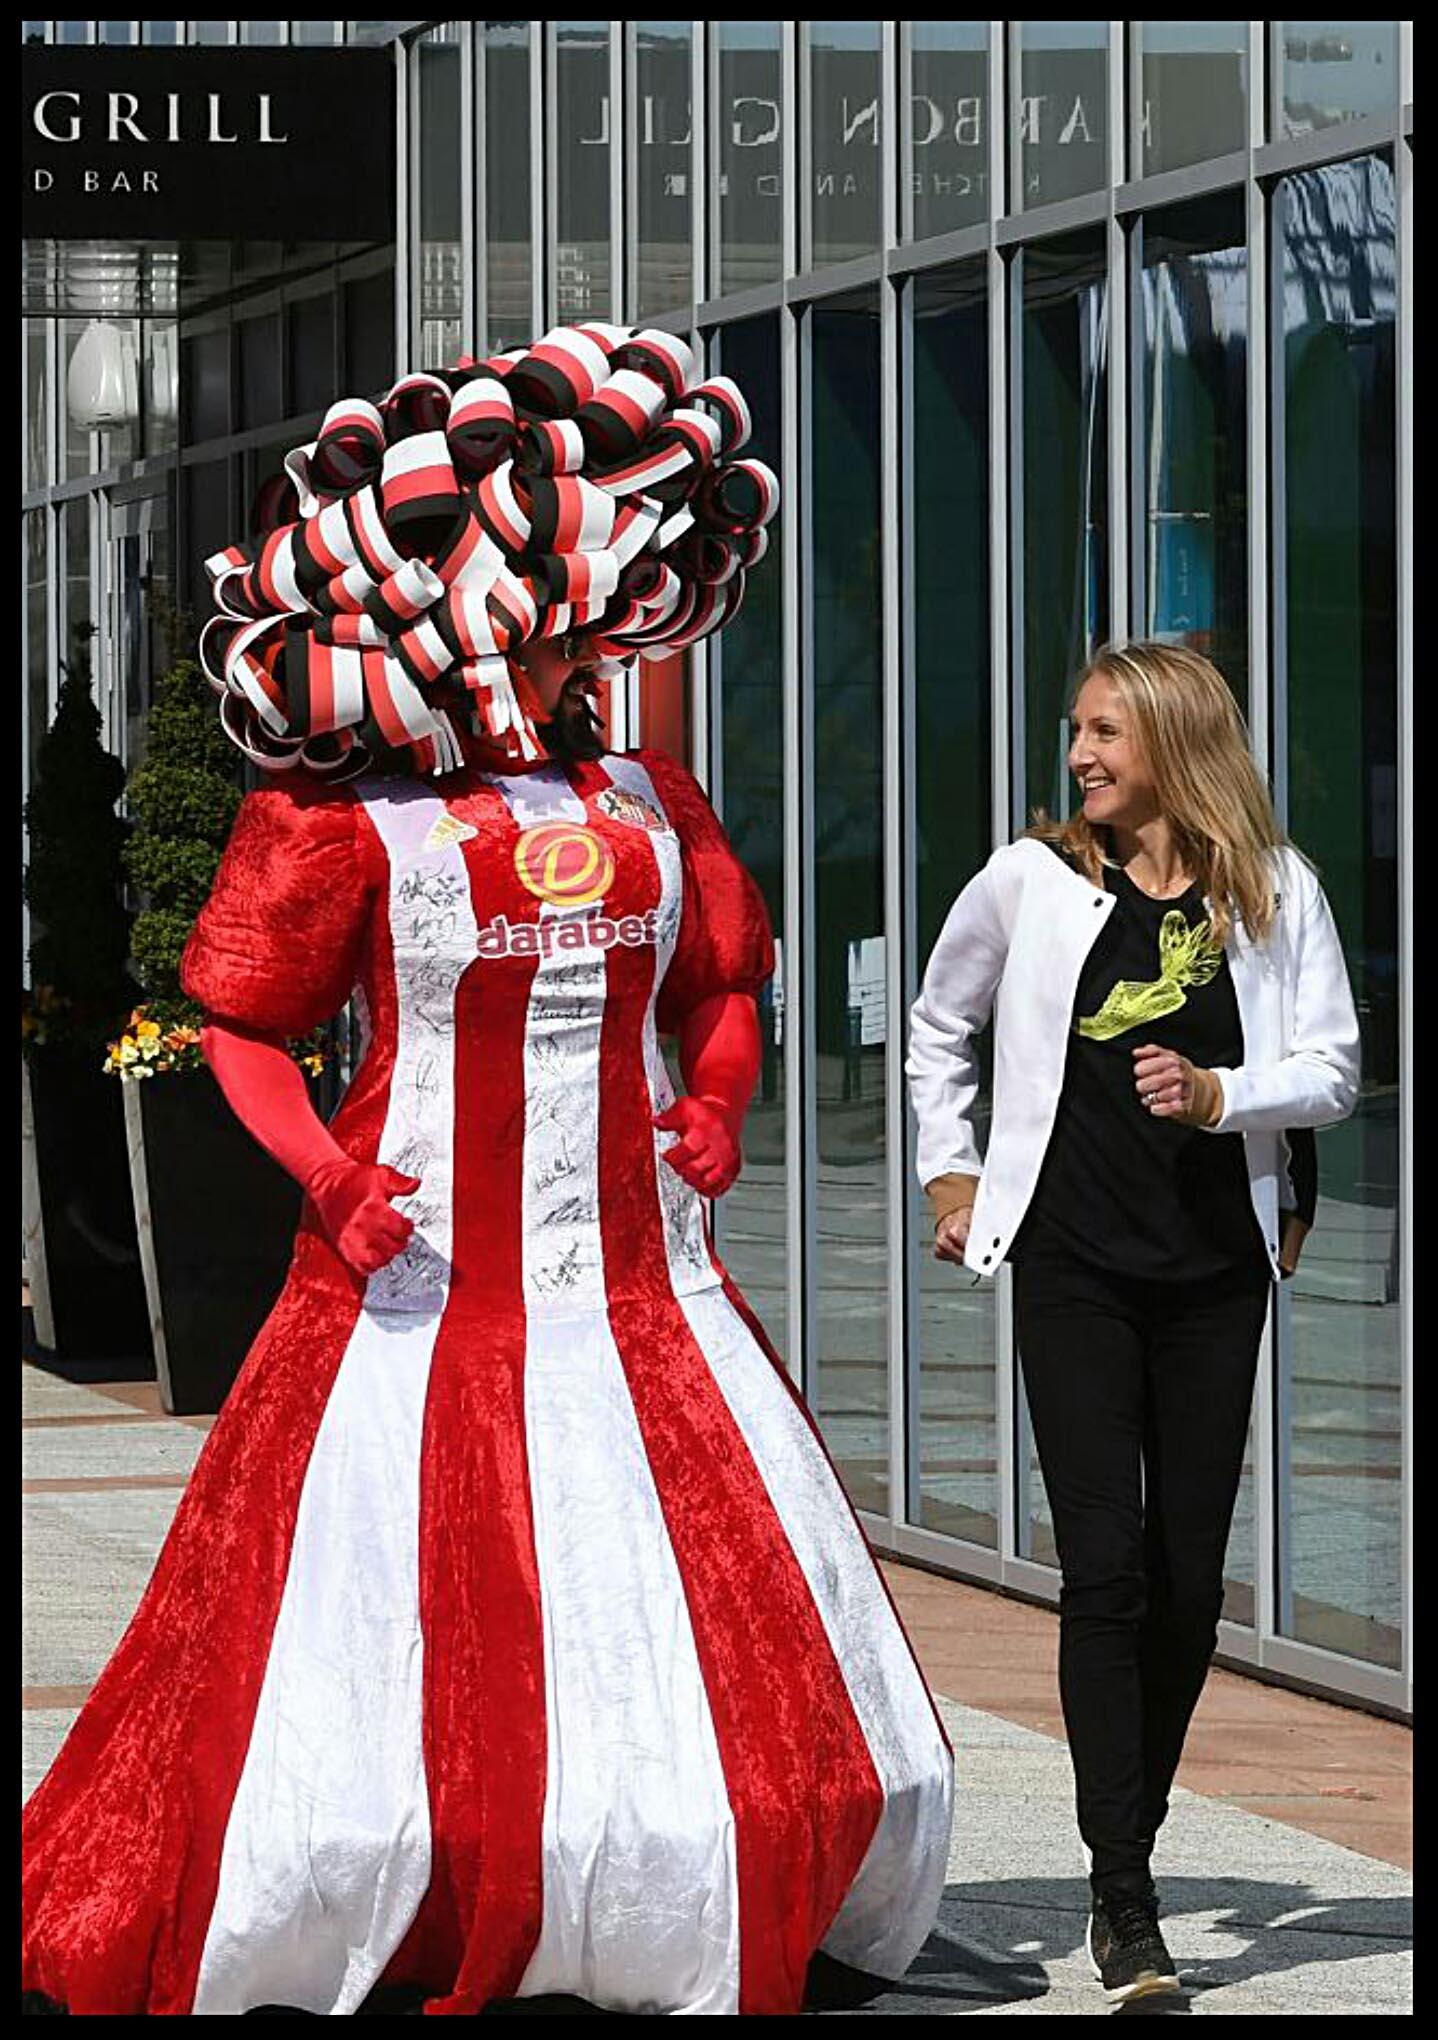 Big-Pink-Dress-THAT-Branding-Company-Sunderland-10km-2017-00145